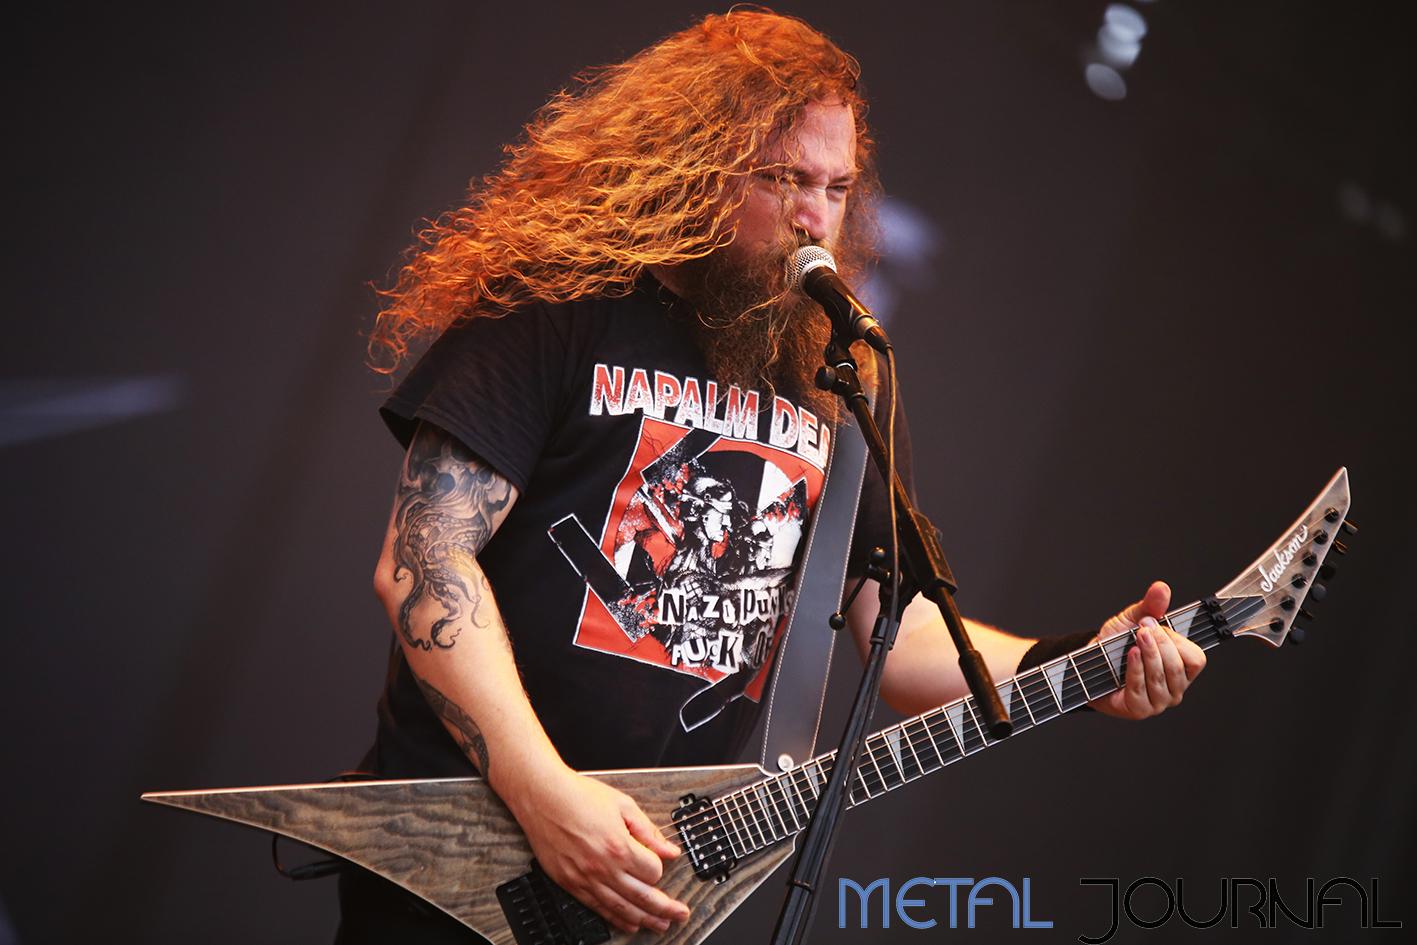 angelus apatrida - metal journal rock fest barcelona 2019 pic 7